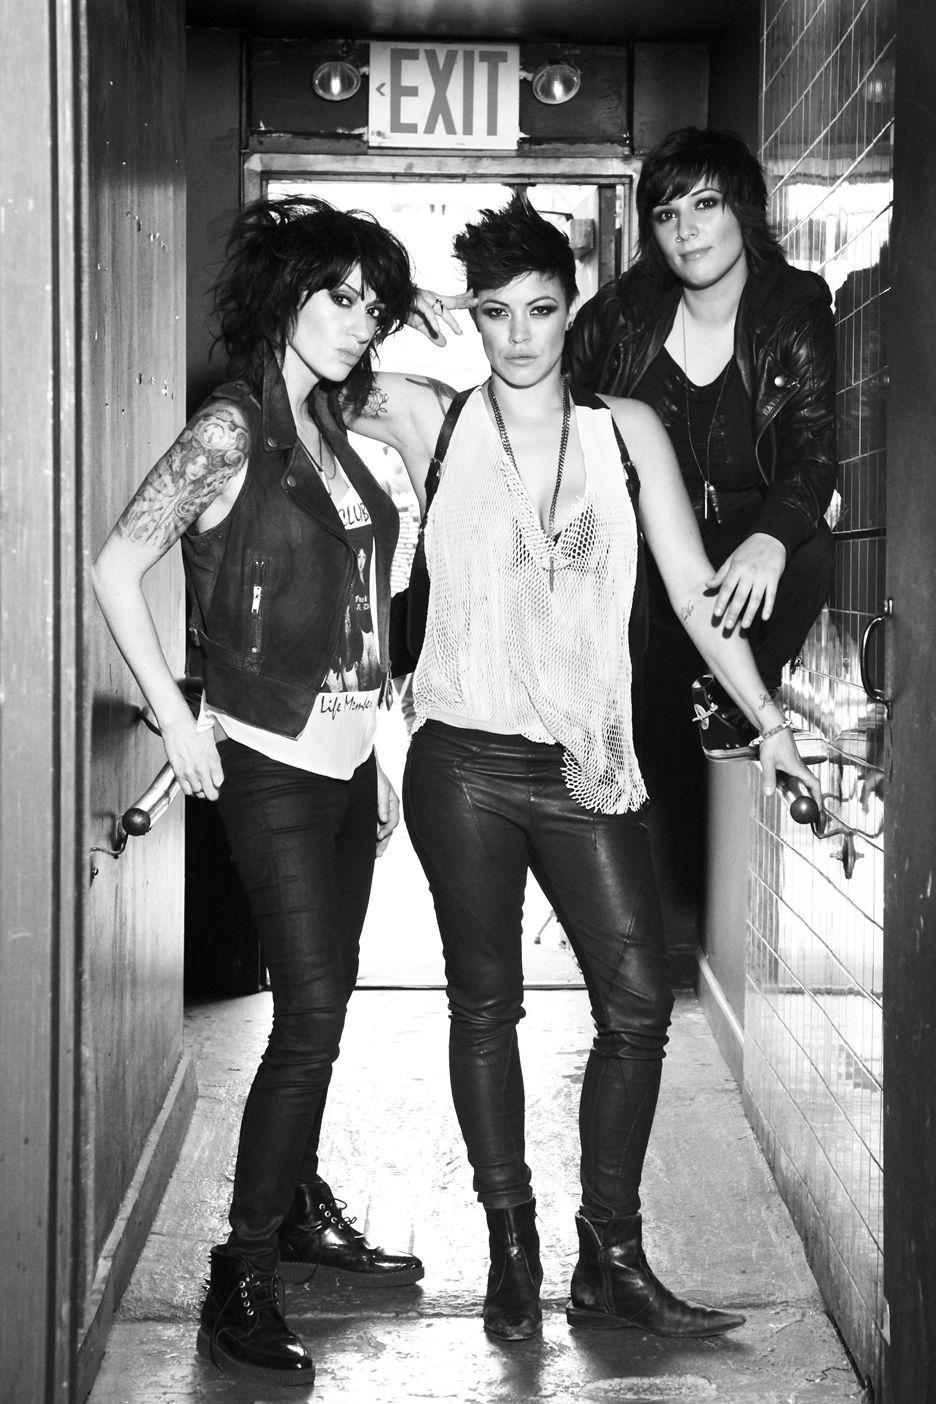 Androgynous Rock Fashion With Kiyomi McCloskey   DapperQ